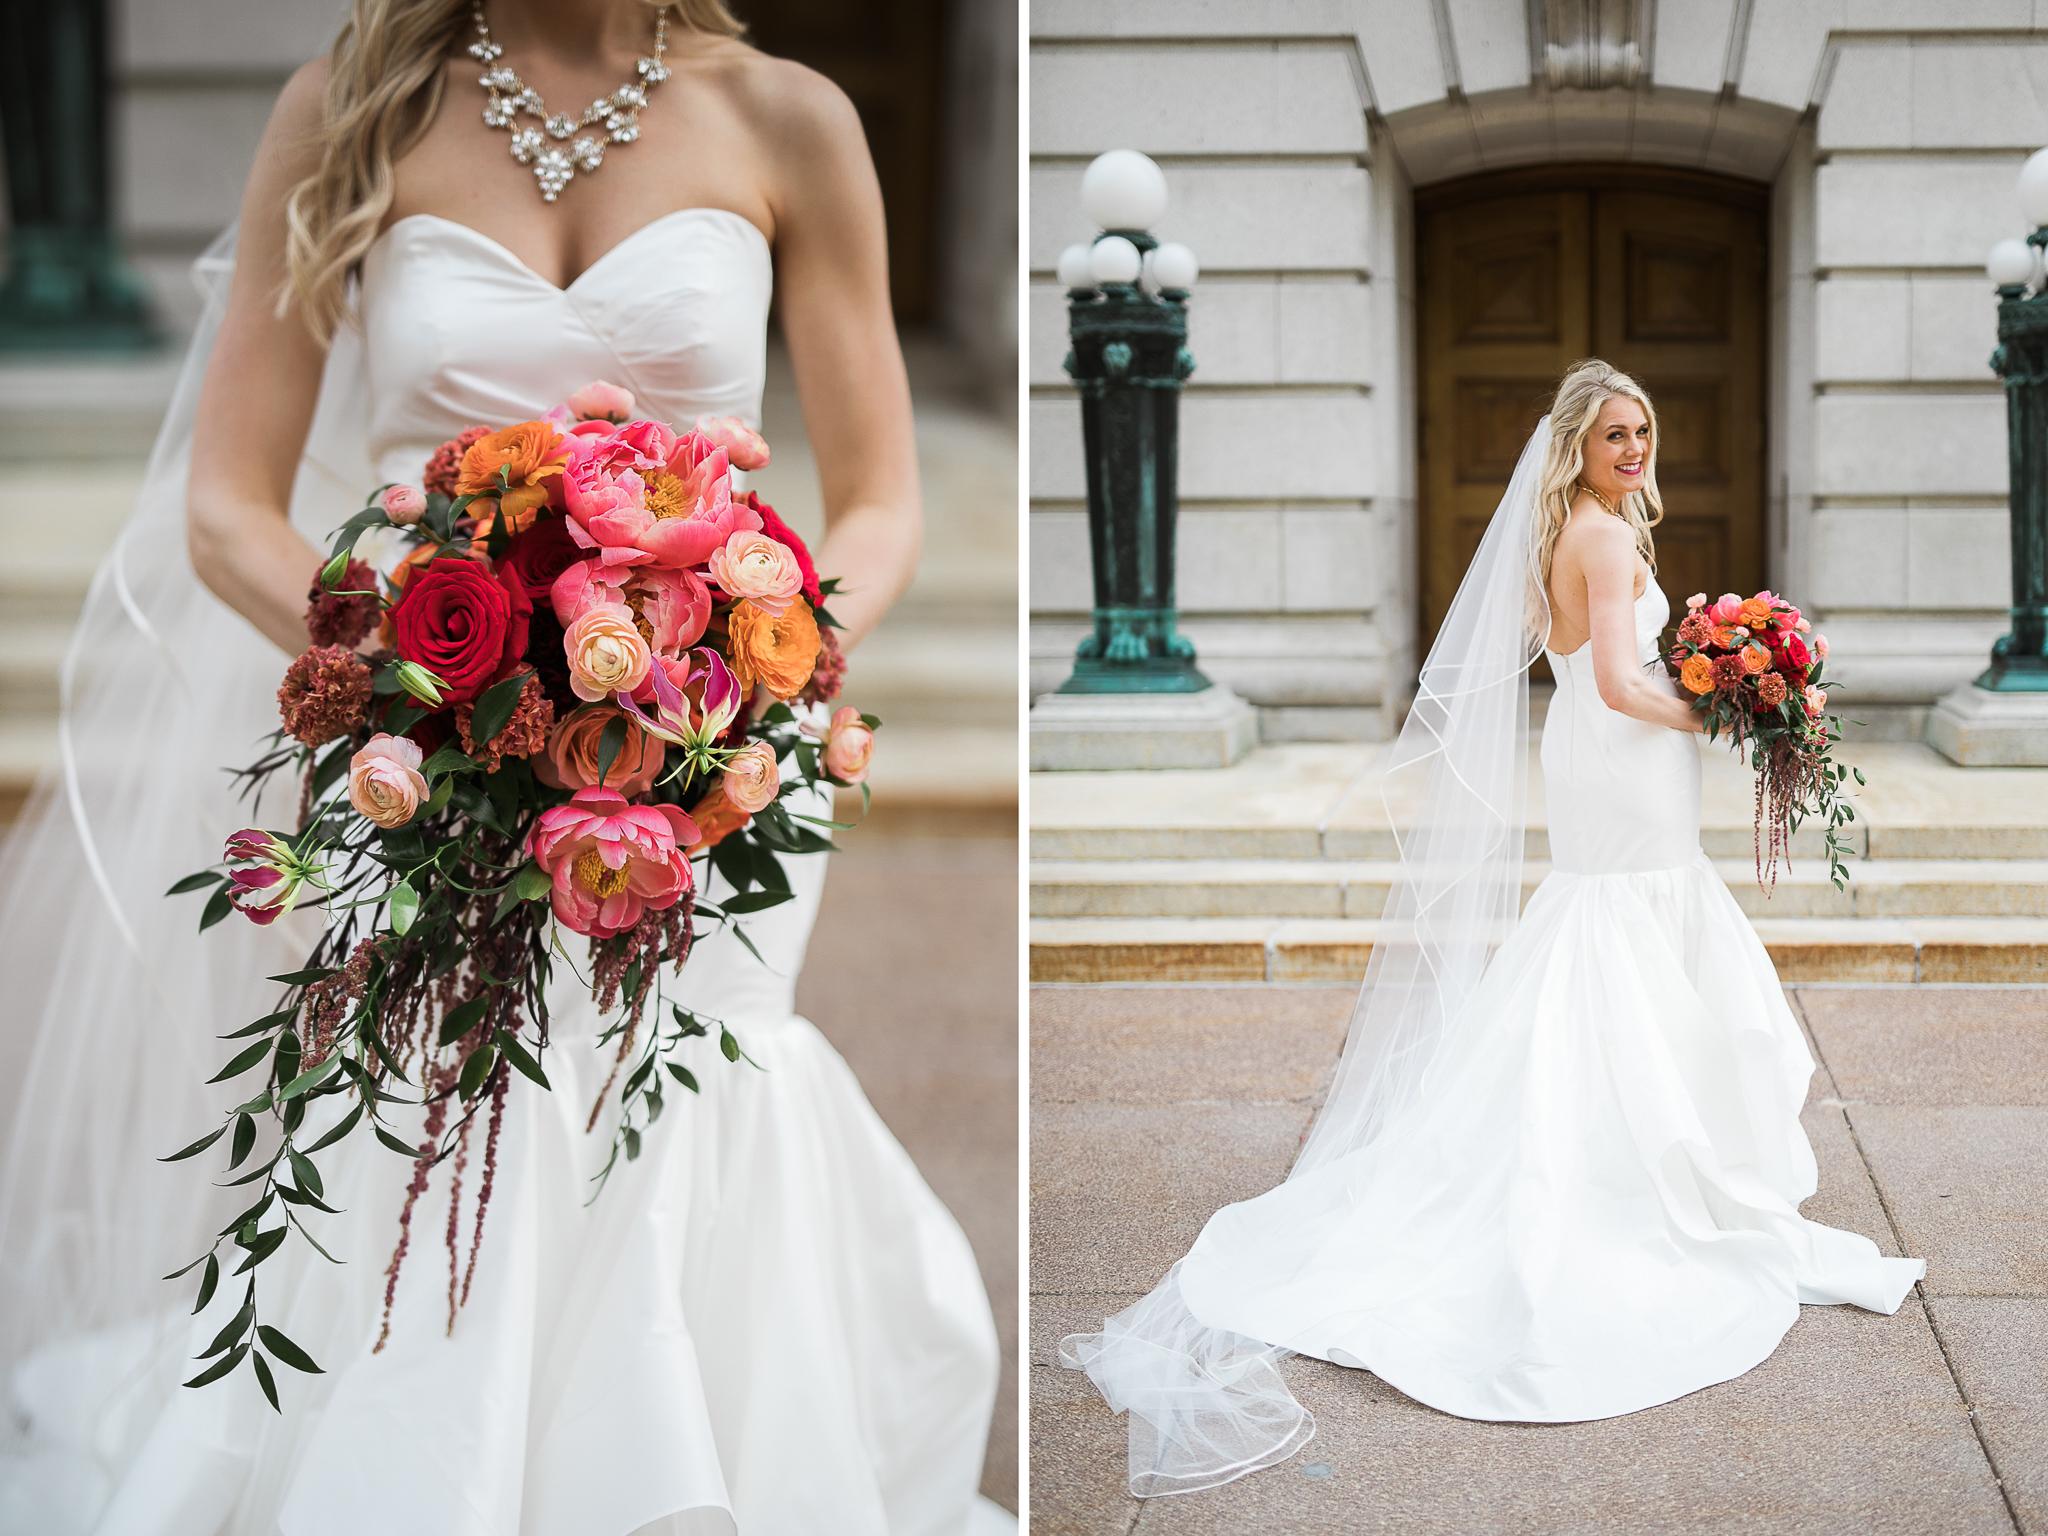 Indian-Fusion-wedding-Madison-Wisconsin_052.jpg